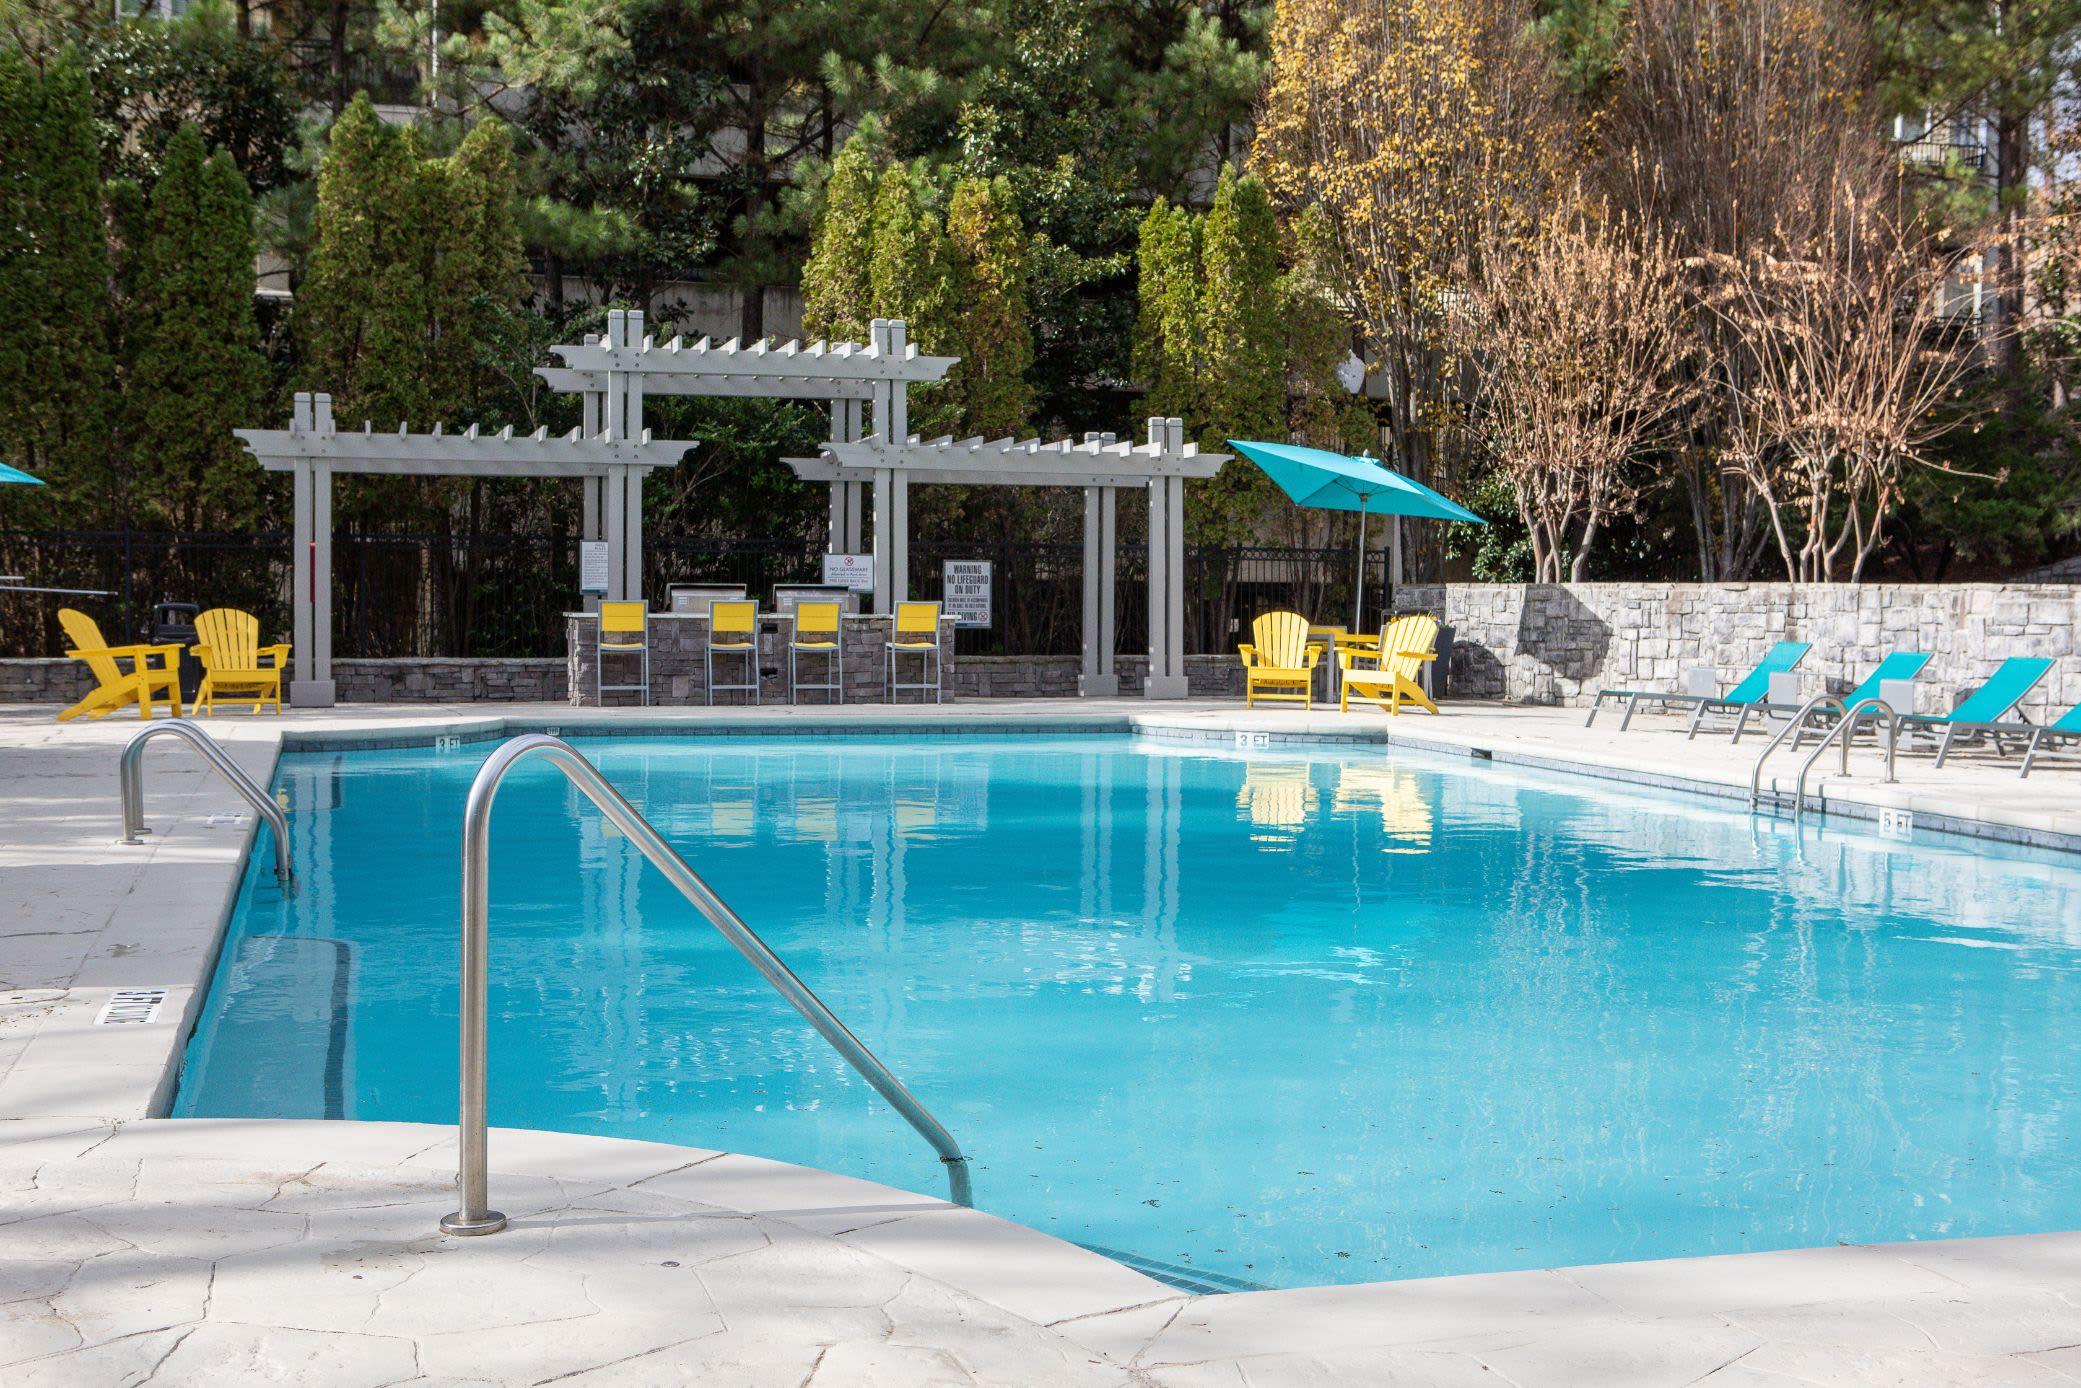 Sparkling community pool at Marq Perimeter in Atlanta, Georgia